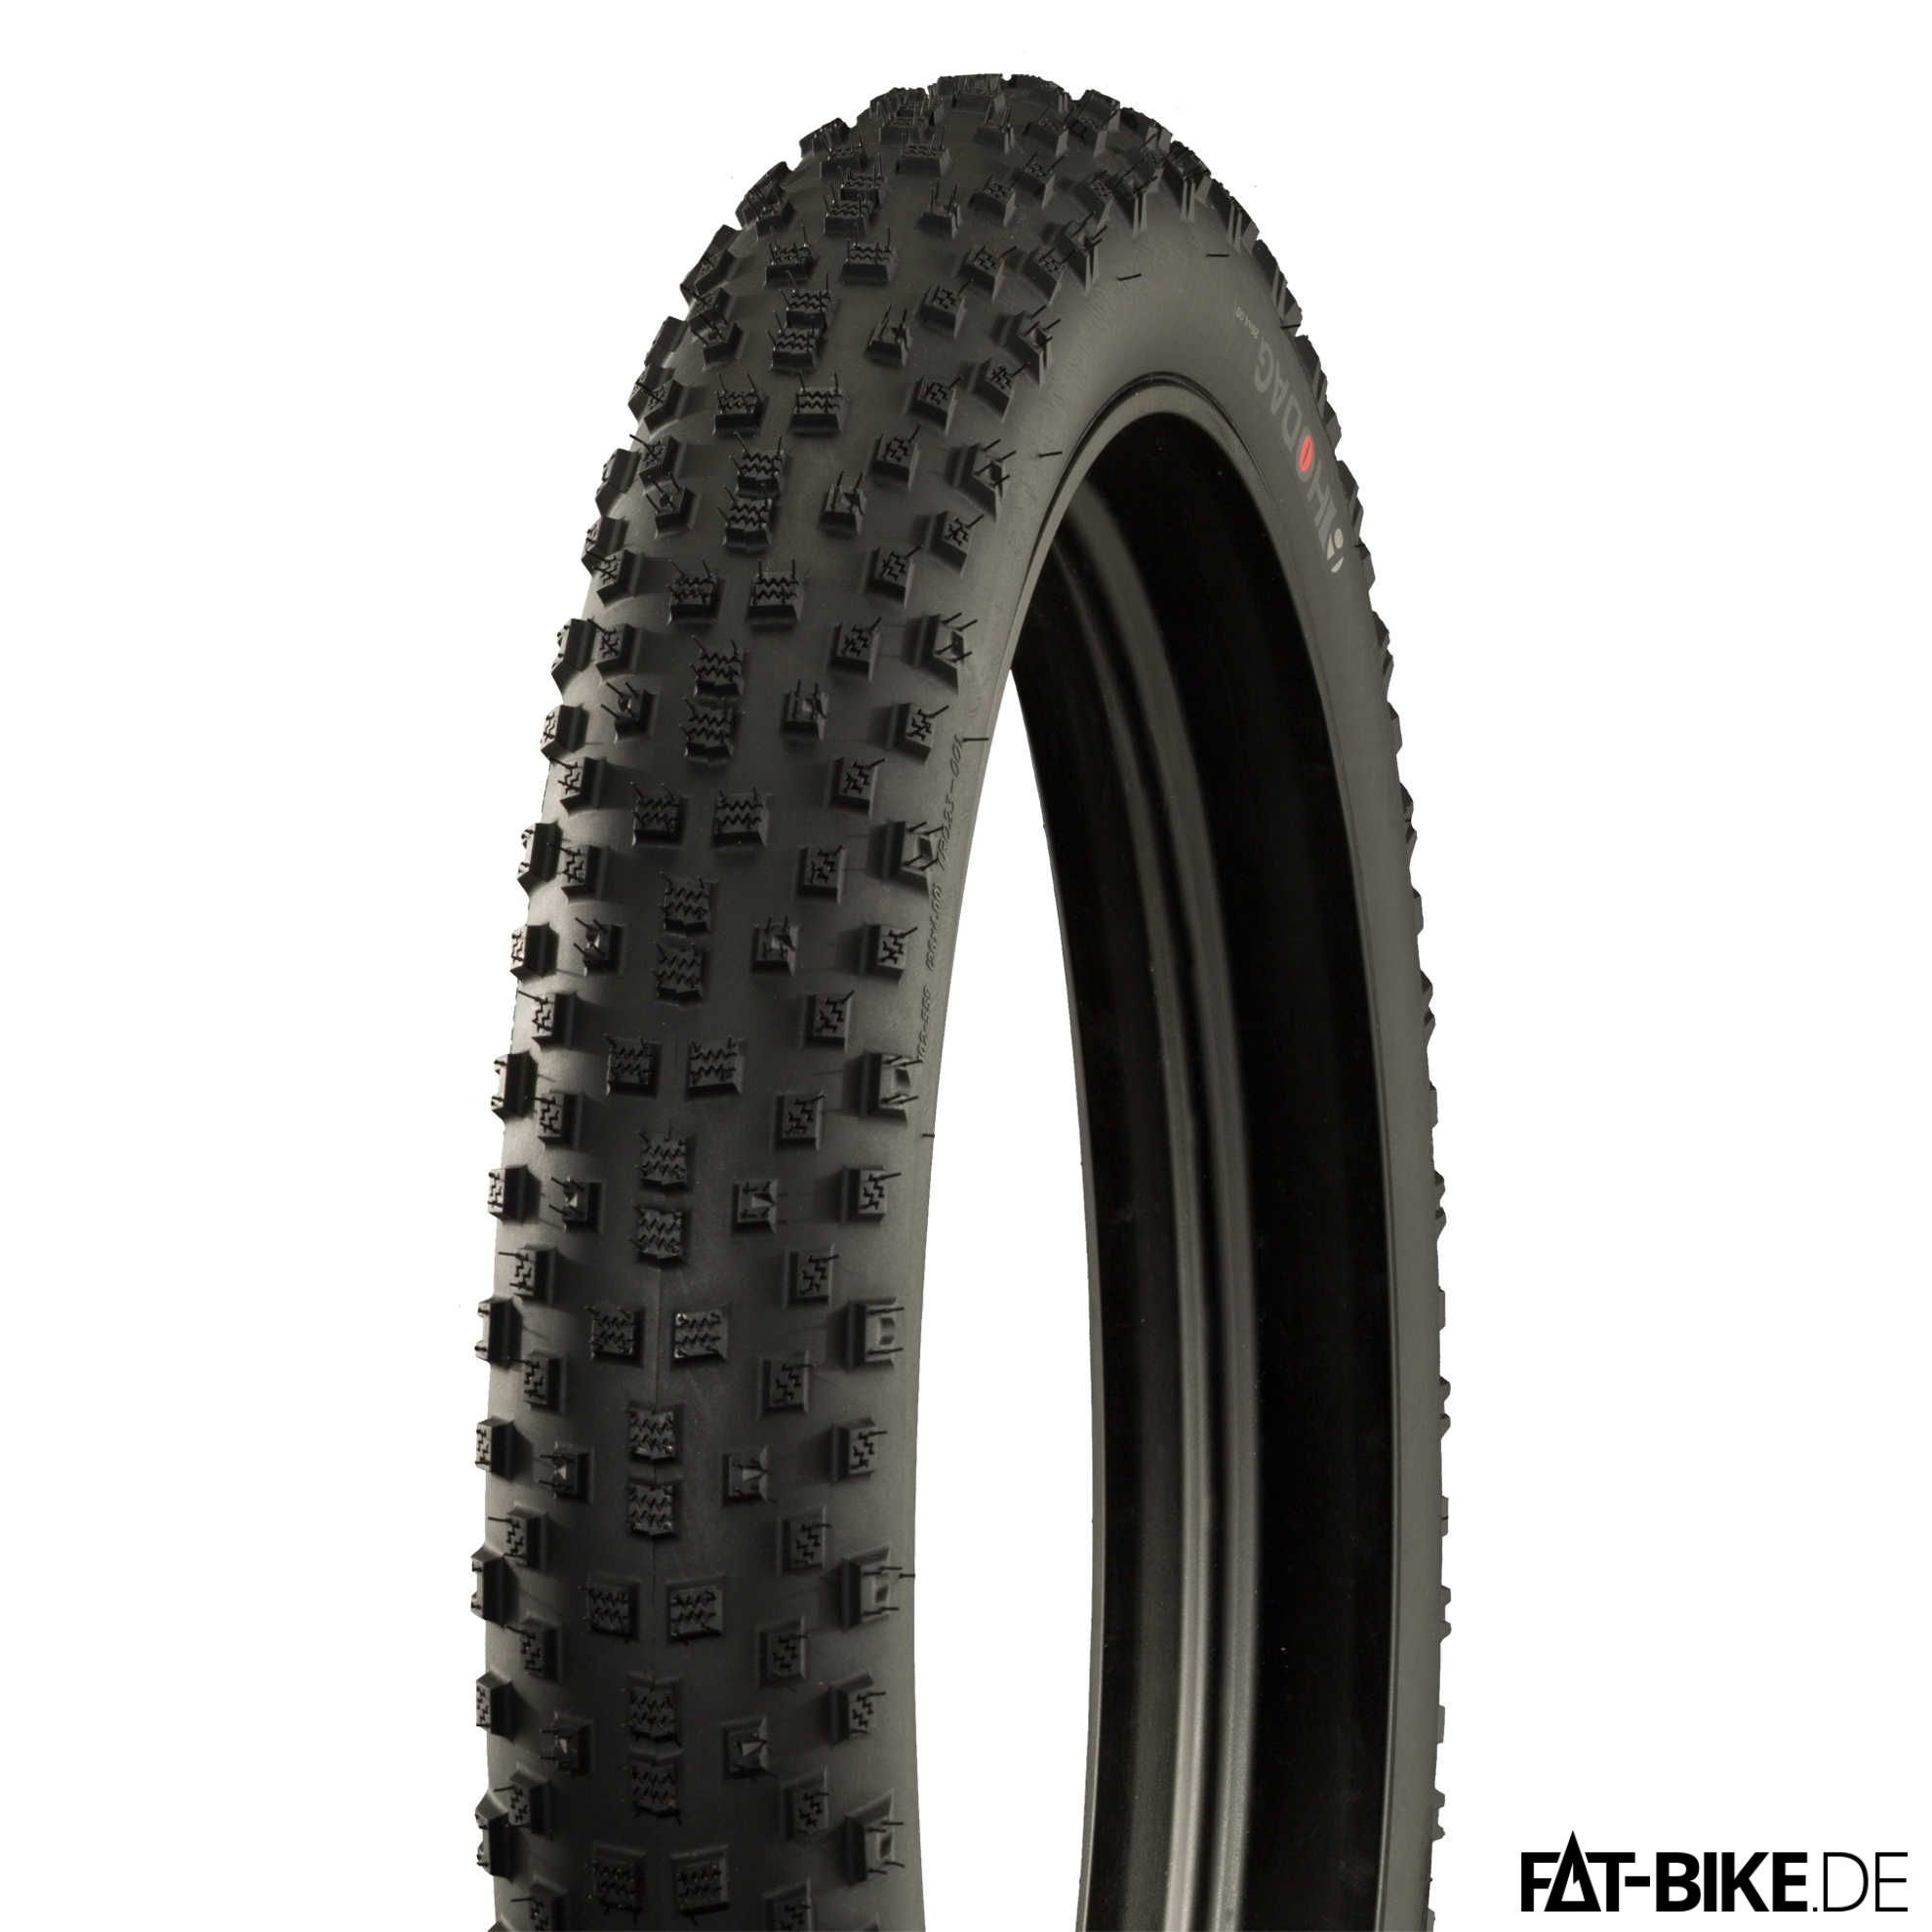 Bontrager Reifen Hodag mit 3,8 Zoll